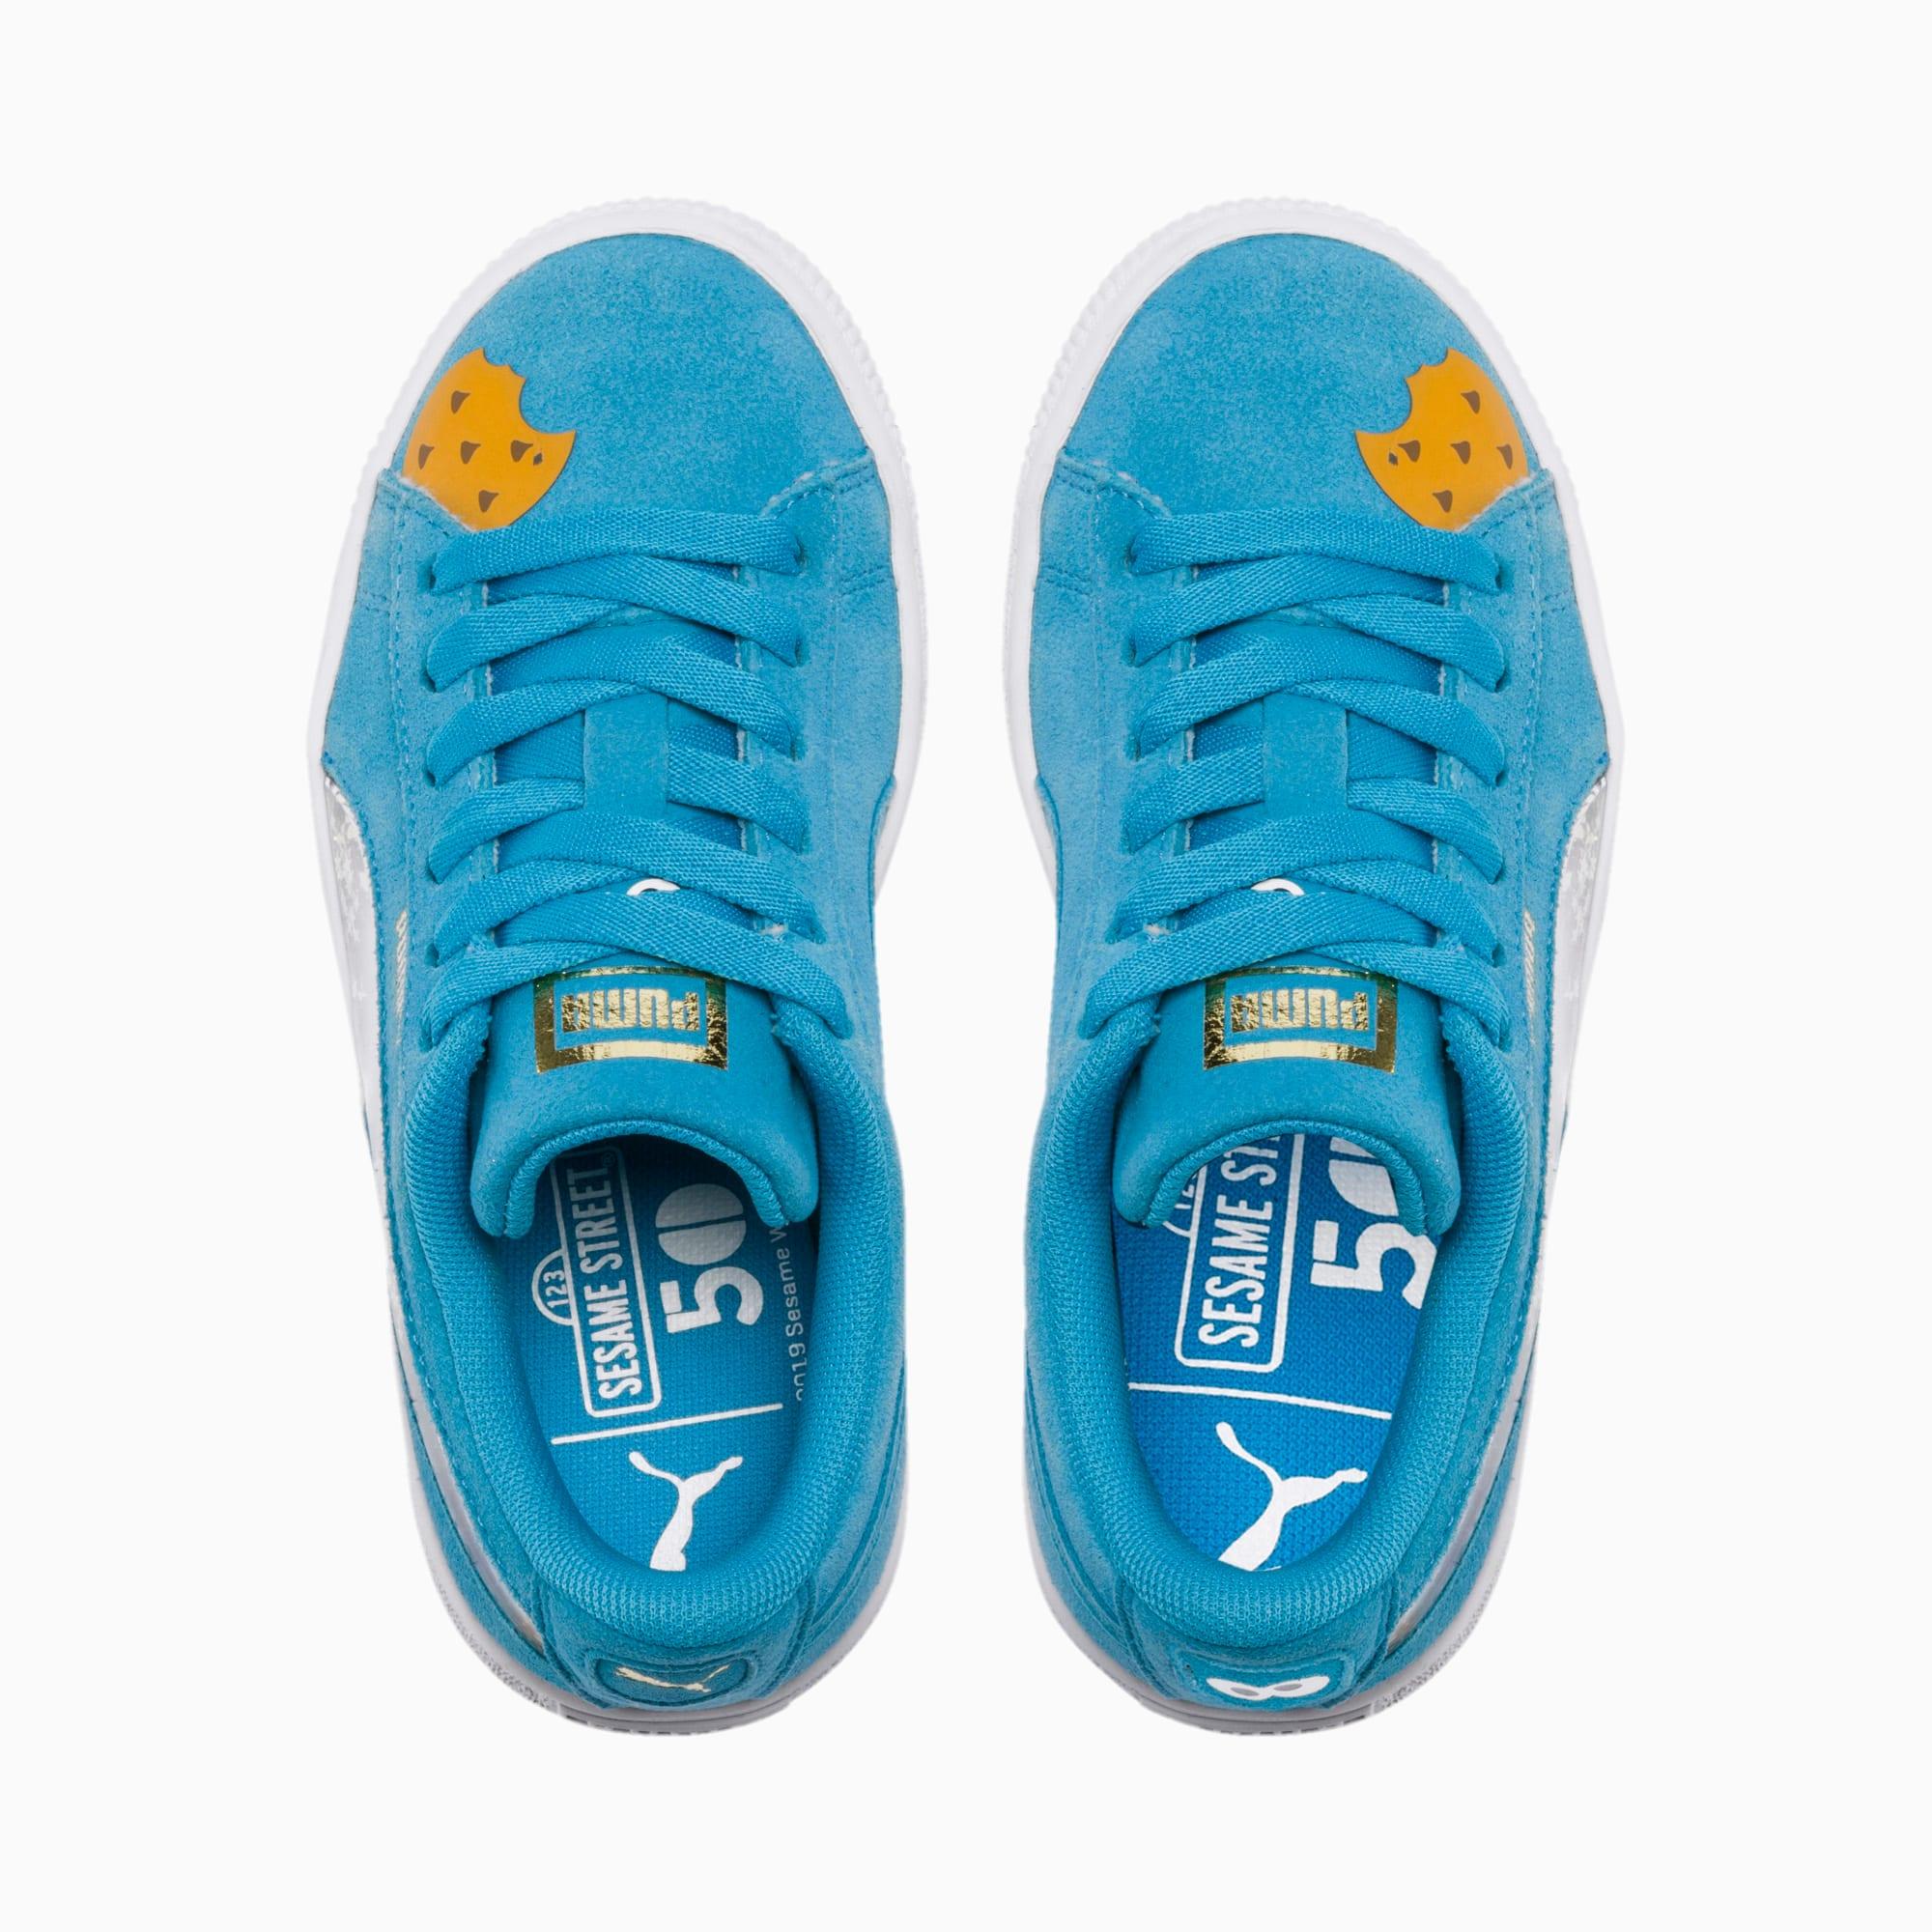 PUMA x SESAME STREET 50 Suede Statement Little Kids' Shoes